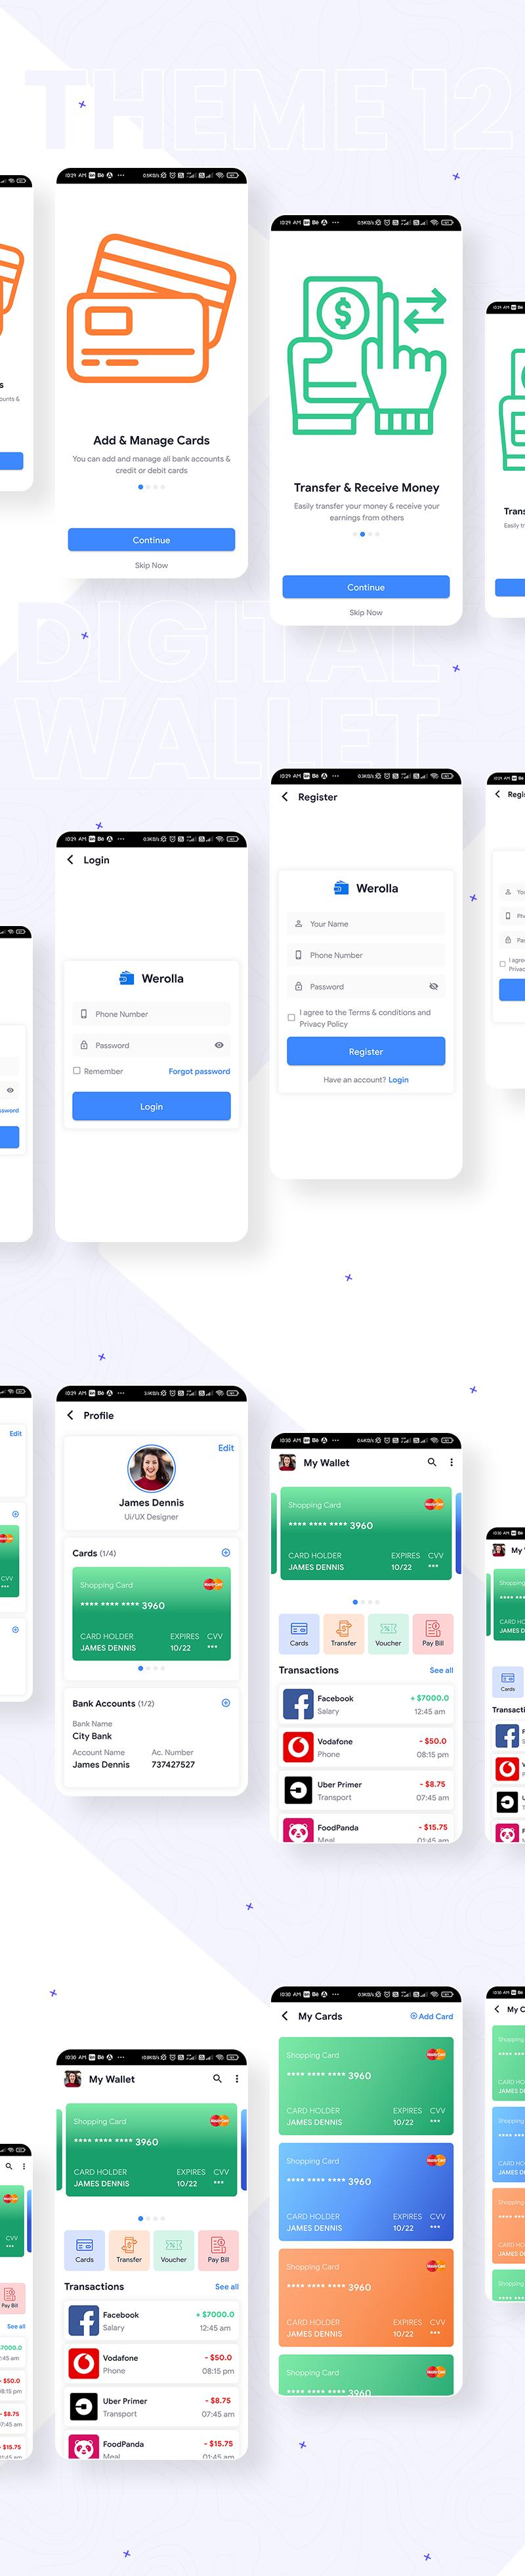 Best Flutter UI Templates | Prokit | Iqonic Design biggest flutter 2.0 ui kit ProKit theme 12